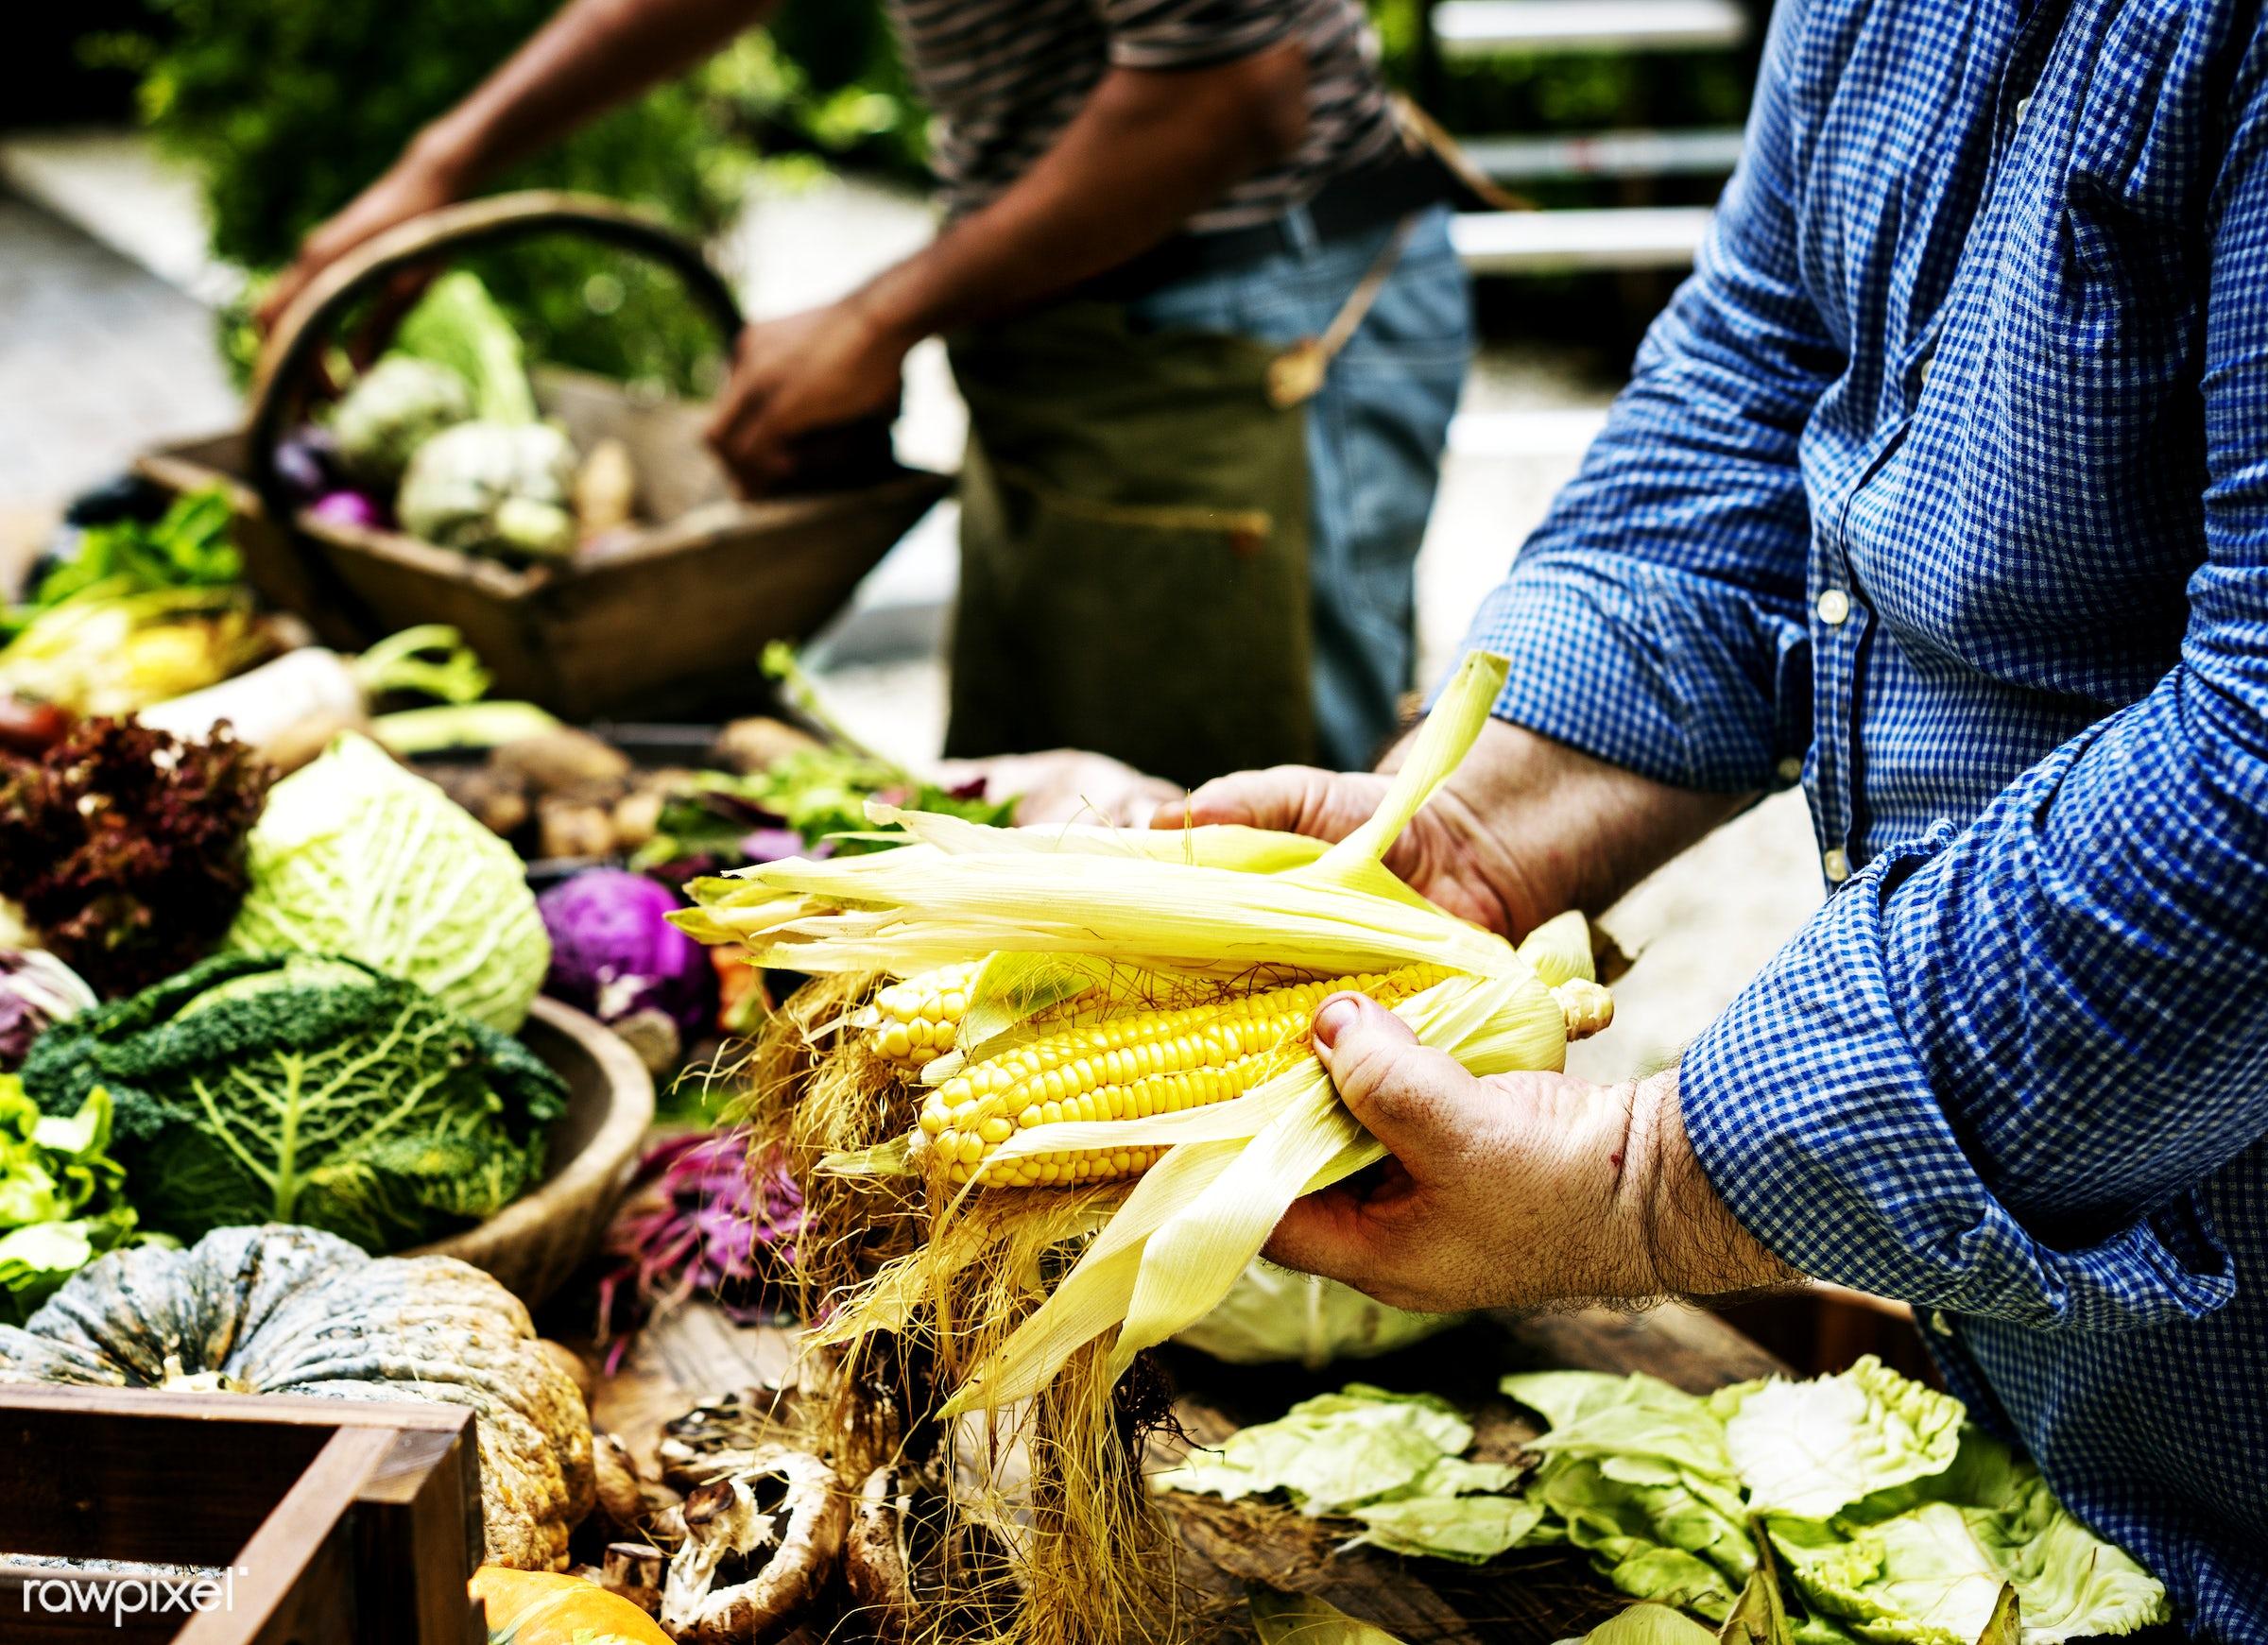 raw, buy, diverse, herbs, caucasian, ingredients, farm, nature, farmer, sell, fresh, hands, products, closeup, corns,...